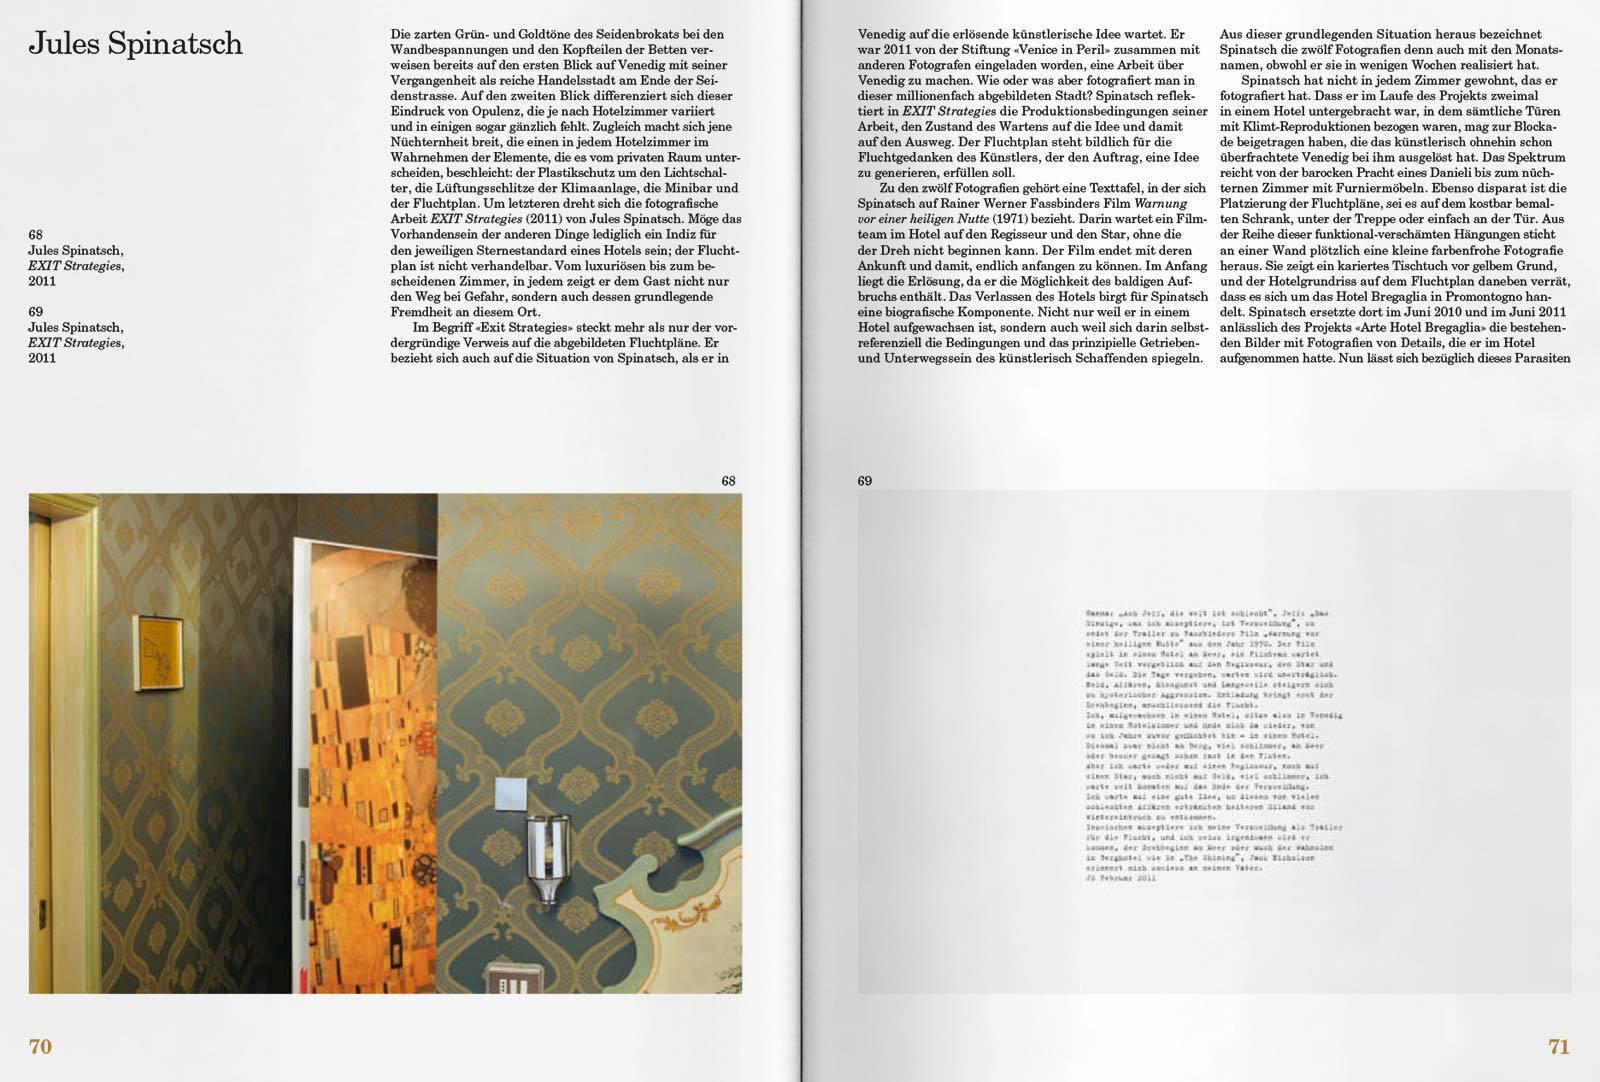 Chambres de Luxe spread08